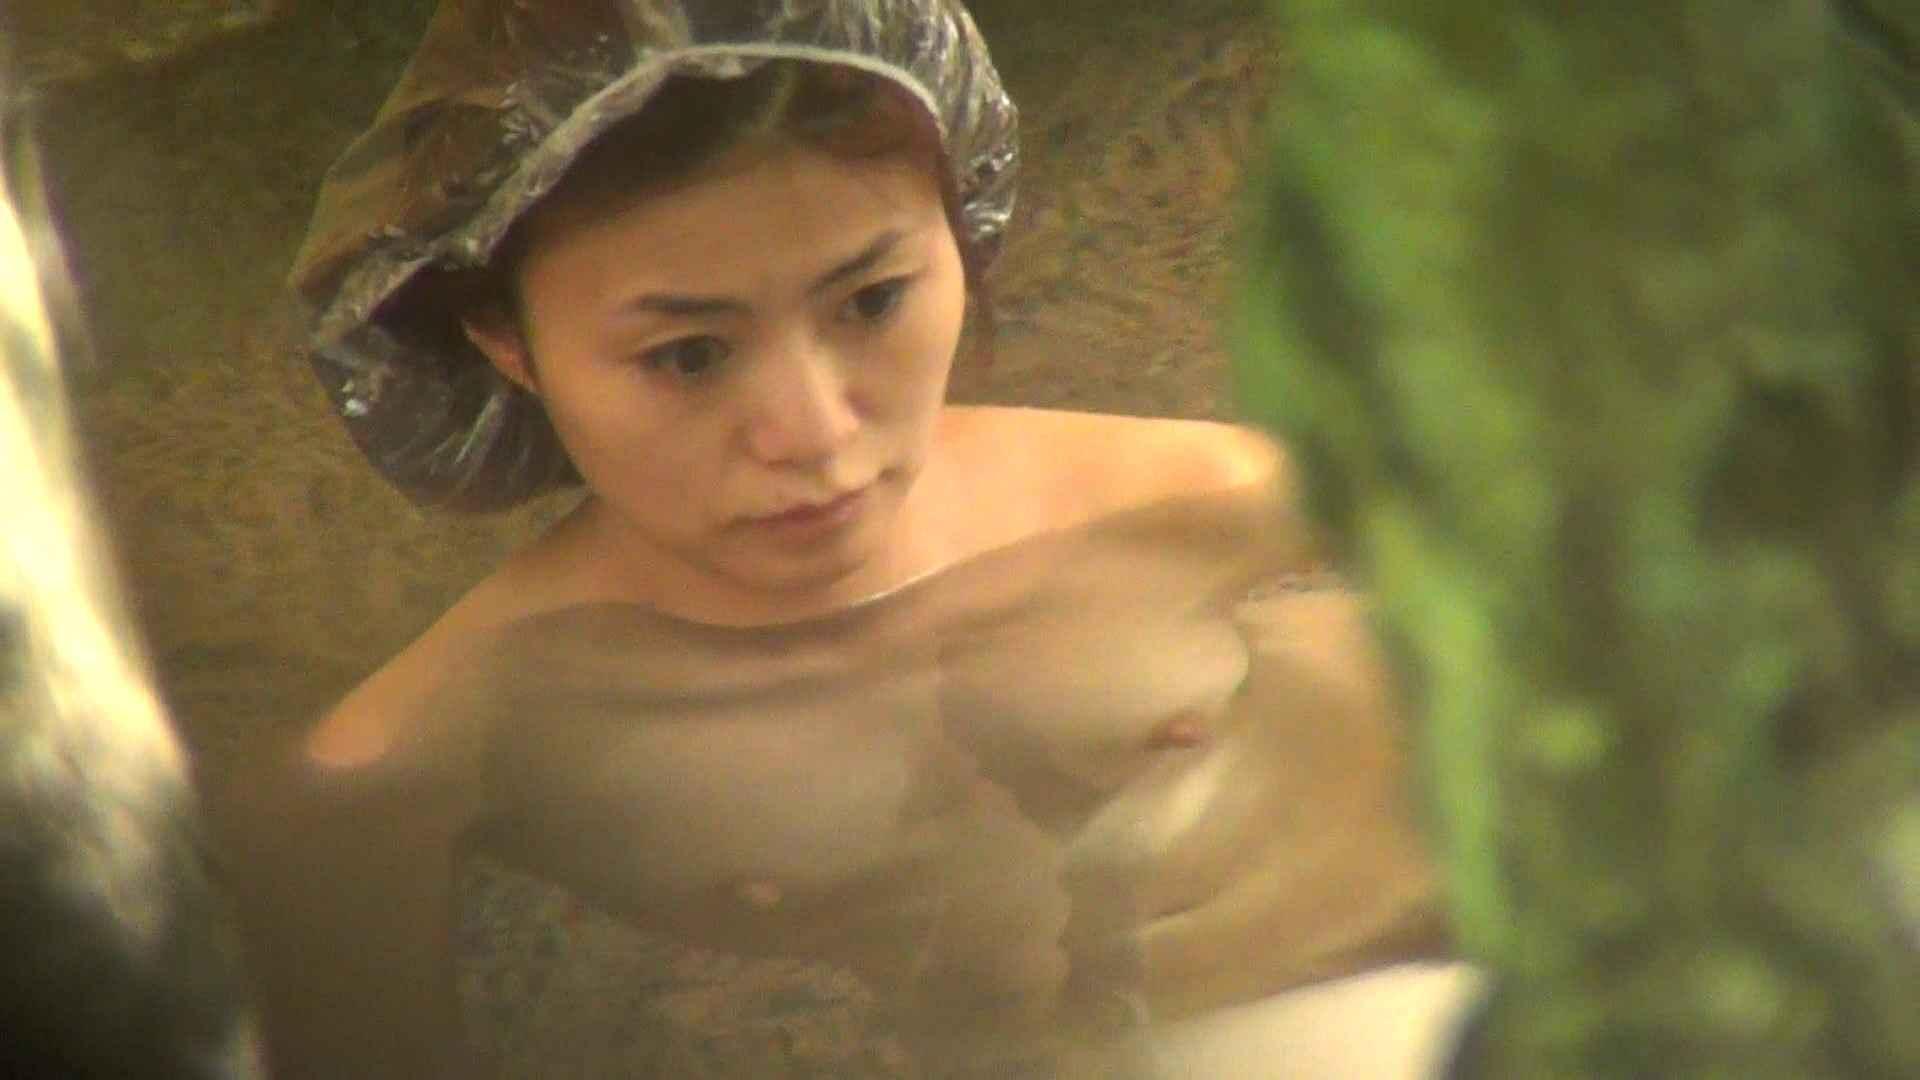 Aquaな露天風呂Vol.264 美しいOLの裸体   露天風呂突入  99pic 22